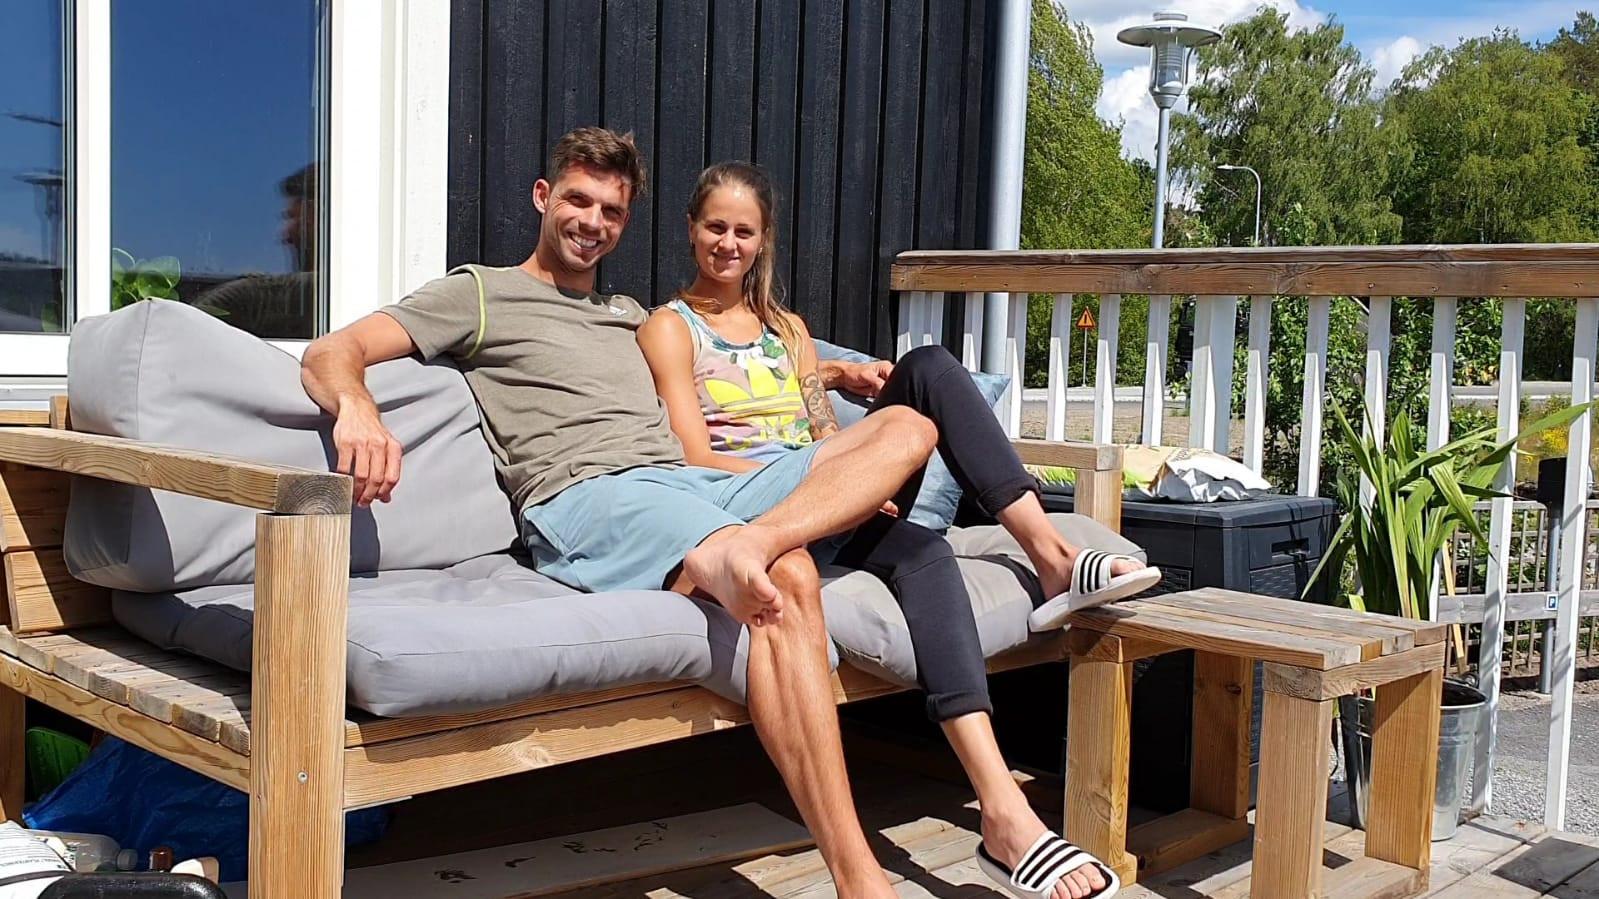 Eelco Sintnicolaas met vriendin Elin Westerlund in Uppsland Väsby in Zweden.